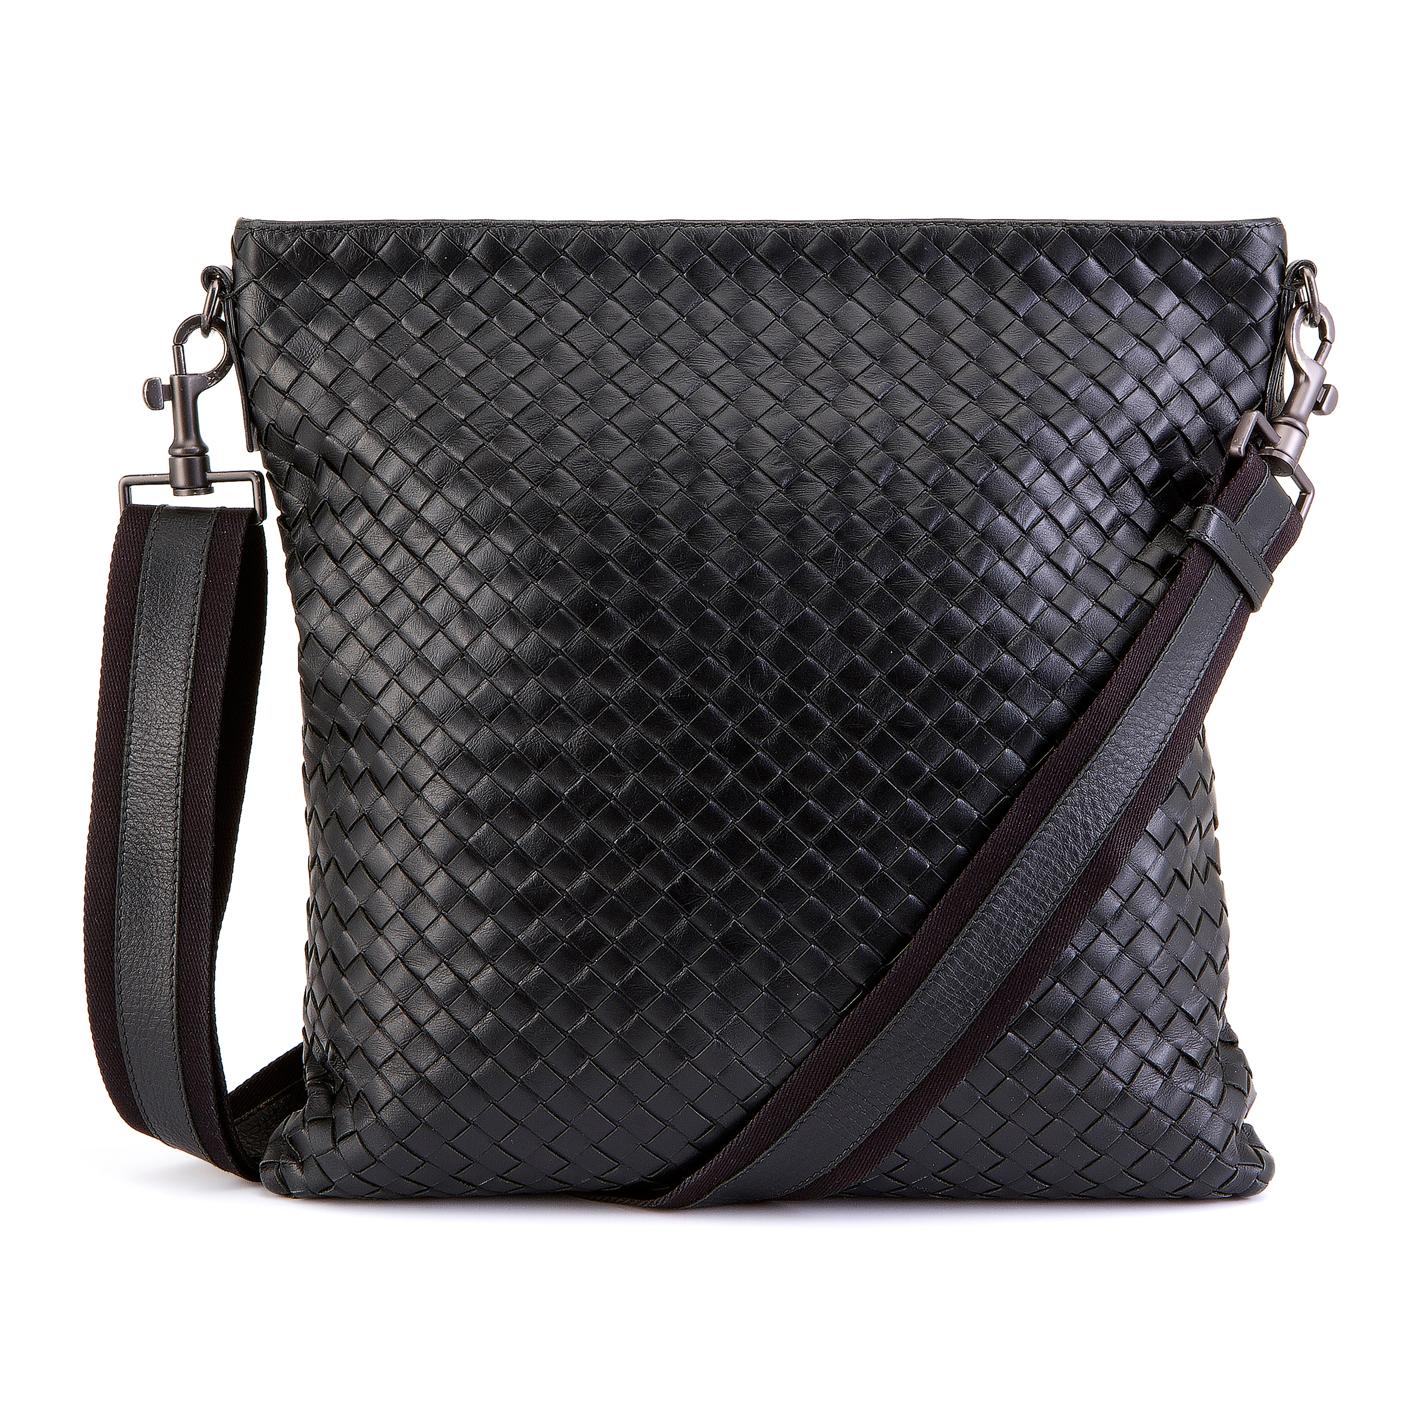 7a5f947eb585 ... Crossbody Bags•BOTTEGA VENETA. Sale!   